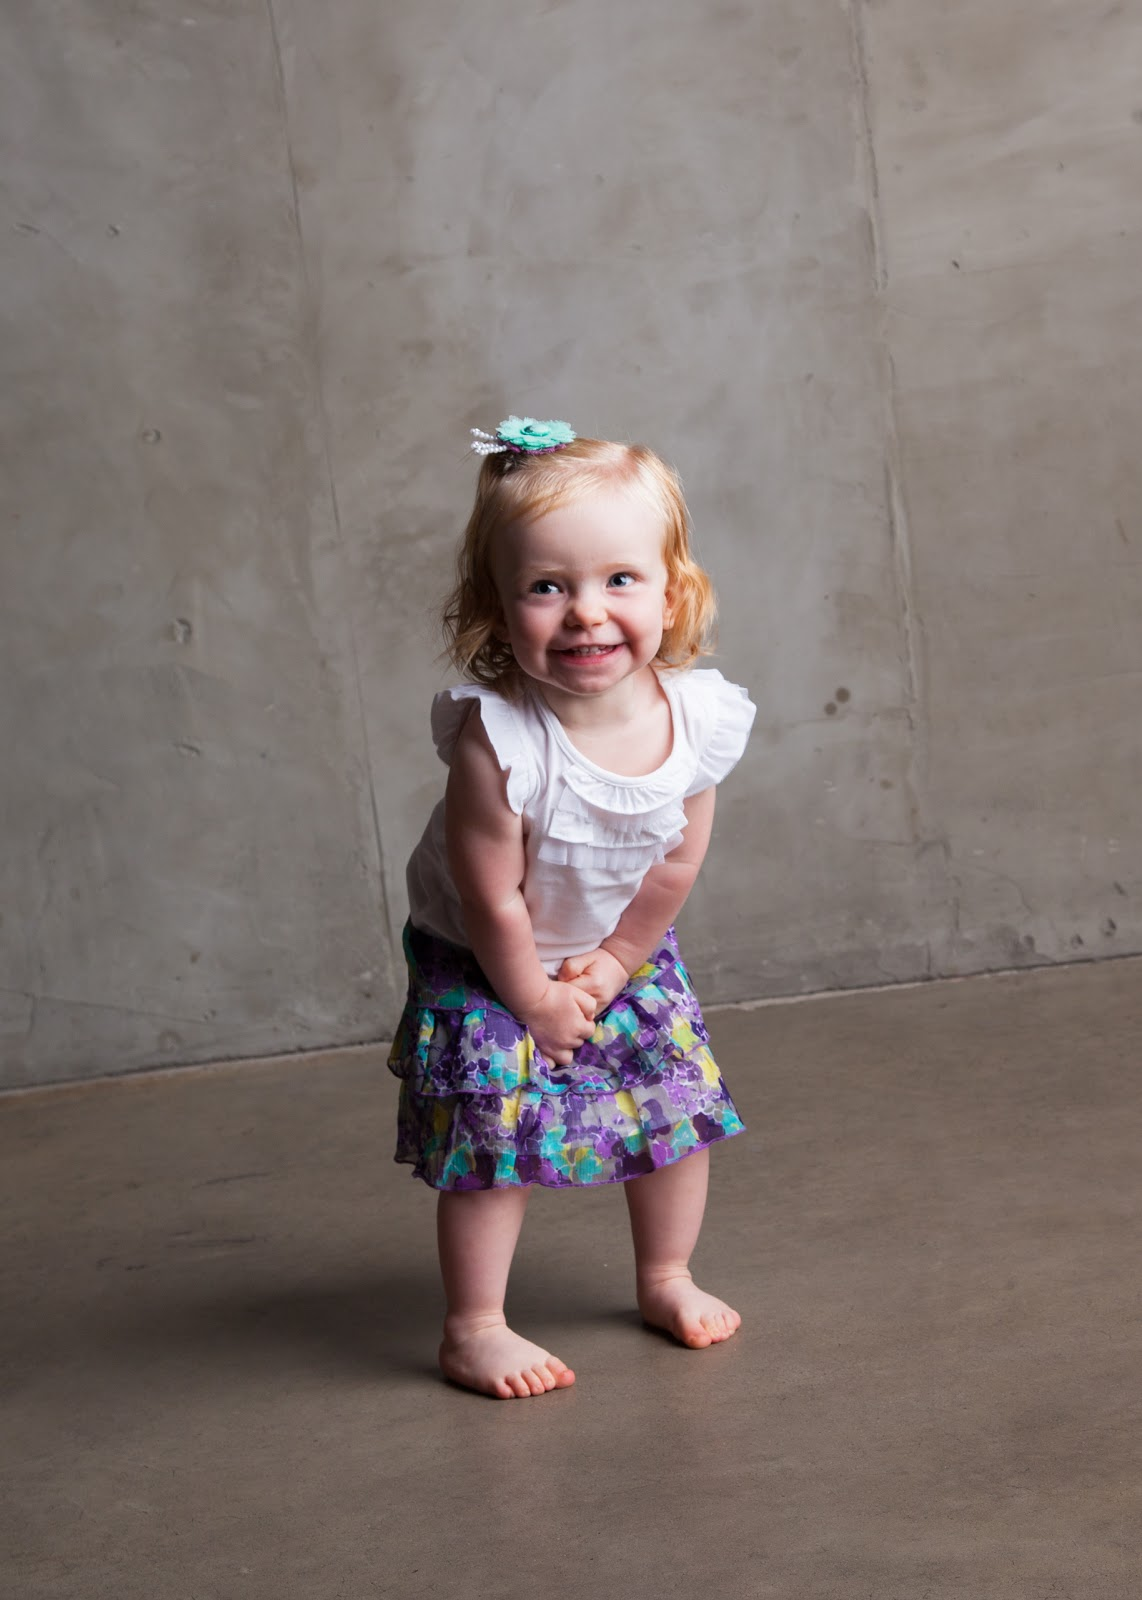 Jared Karen Amp Daphne Our Beautiful Girl 18 Months Old